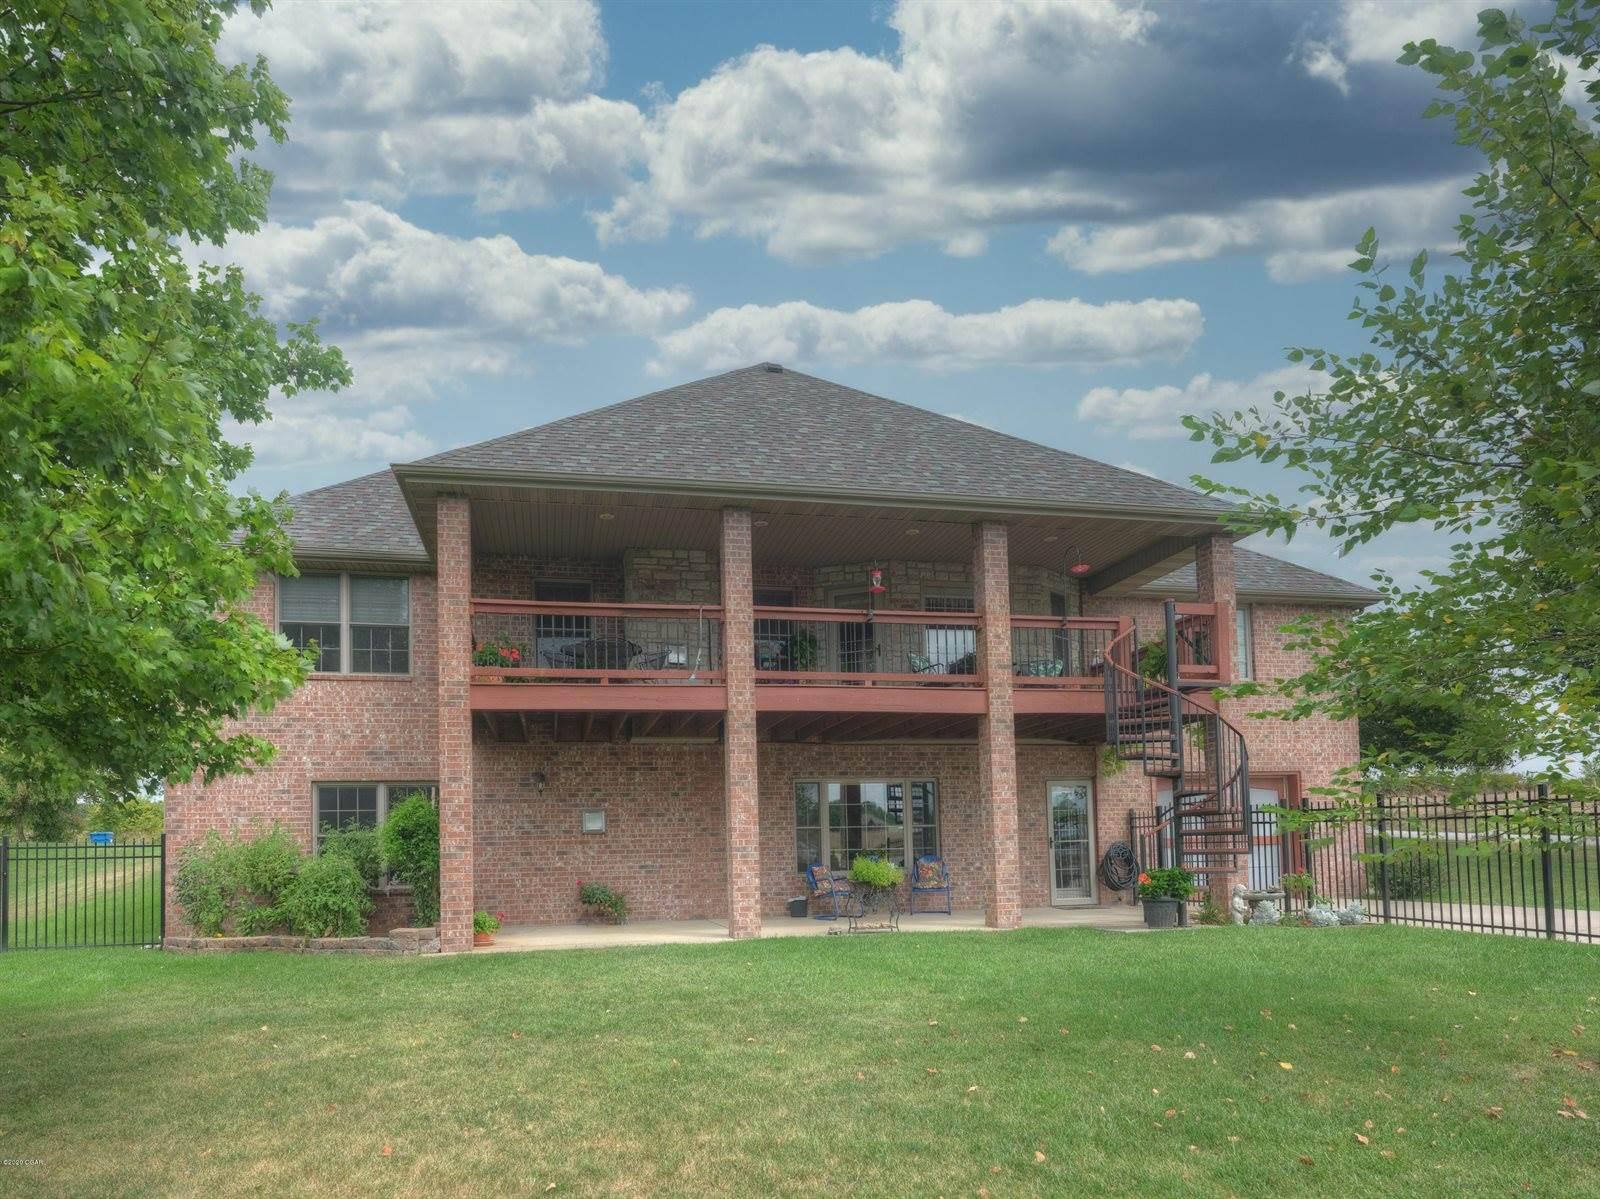 2302 East Hawkins Court, Ozark, MO 65721